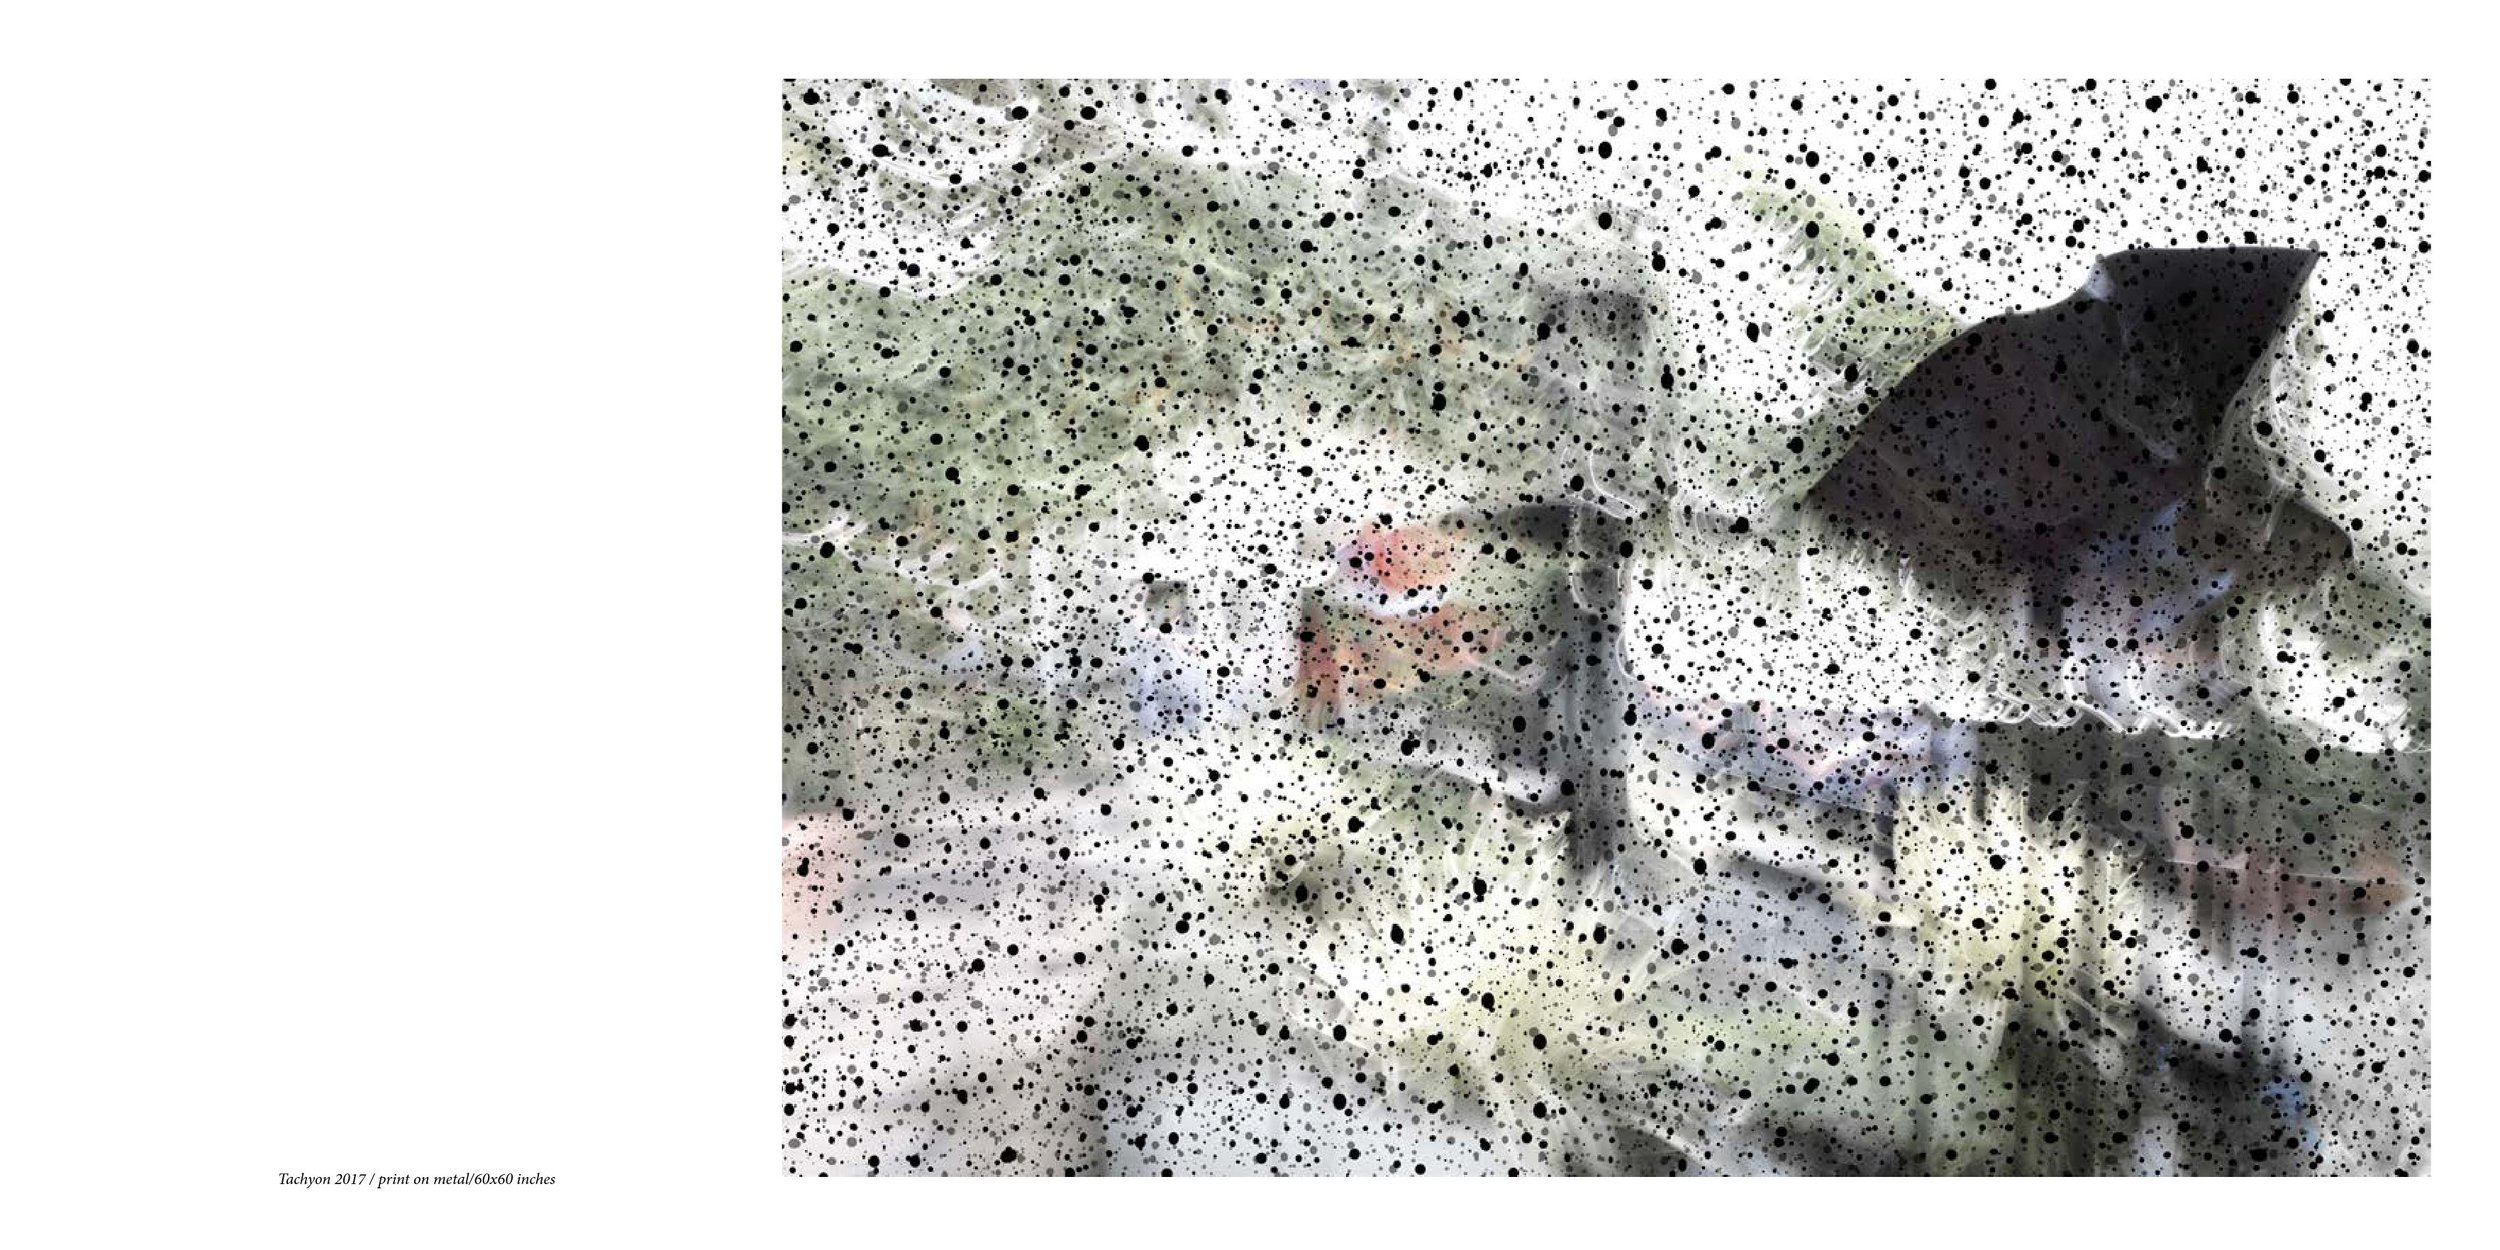 COSTAS PICADAS - QUARK TUNNELING_000005.jpg